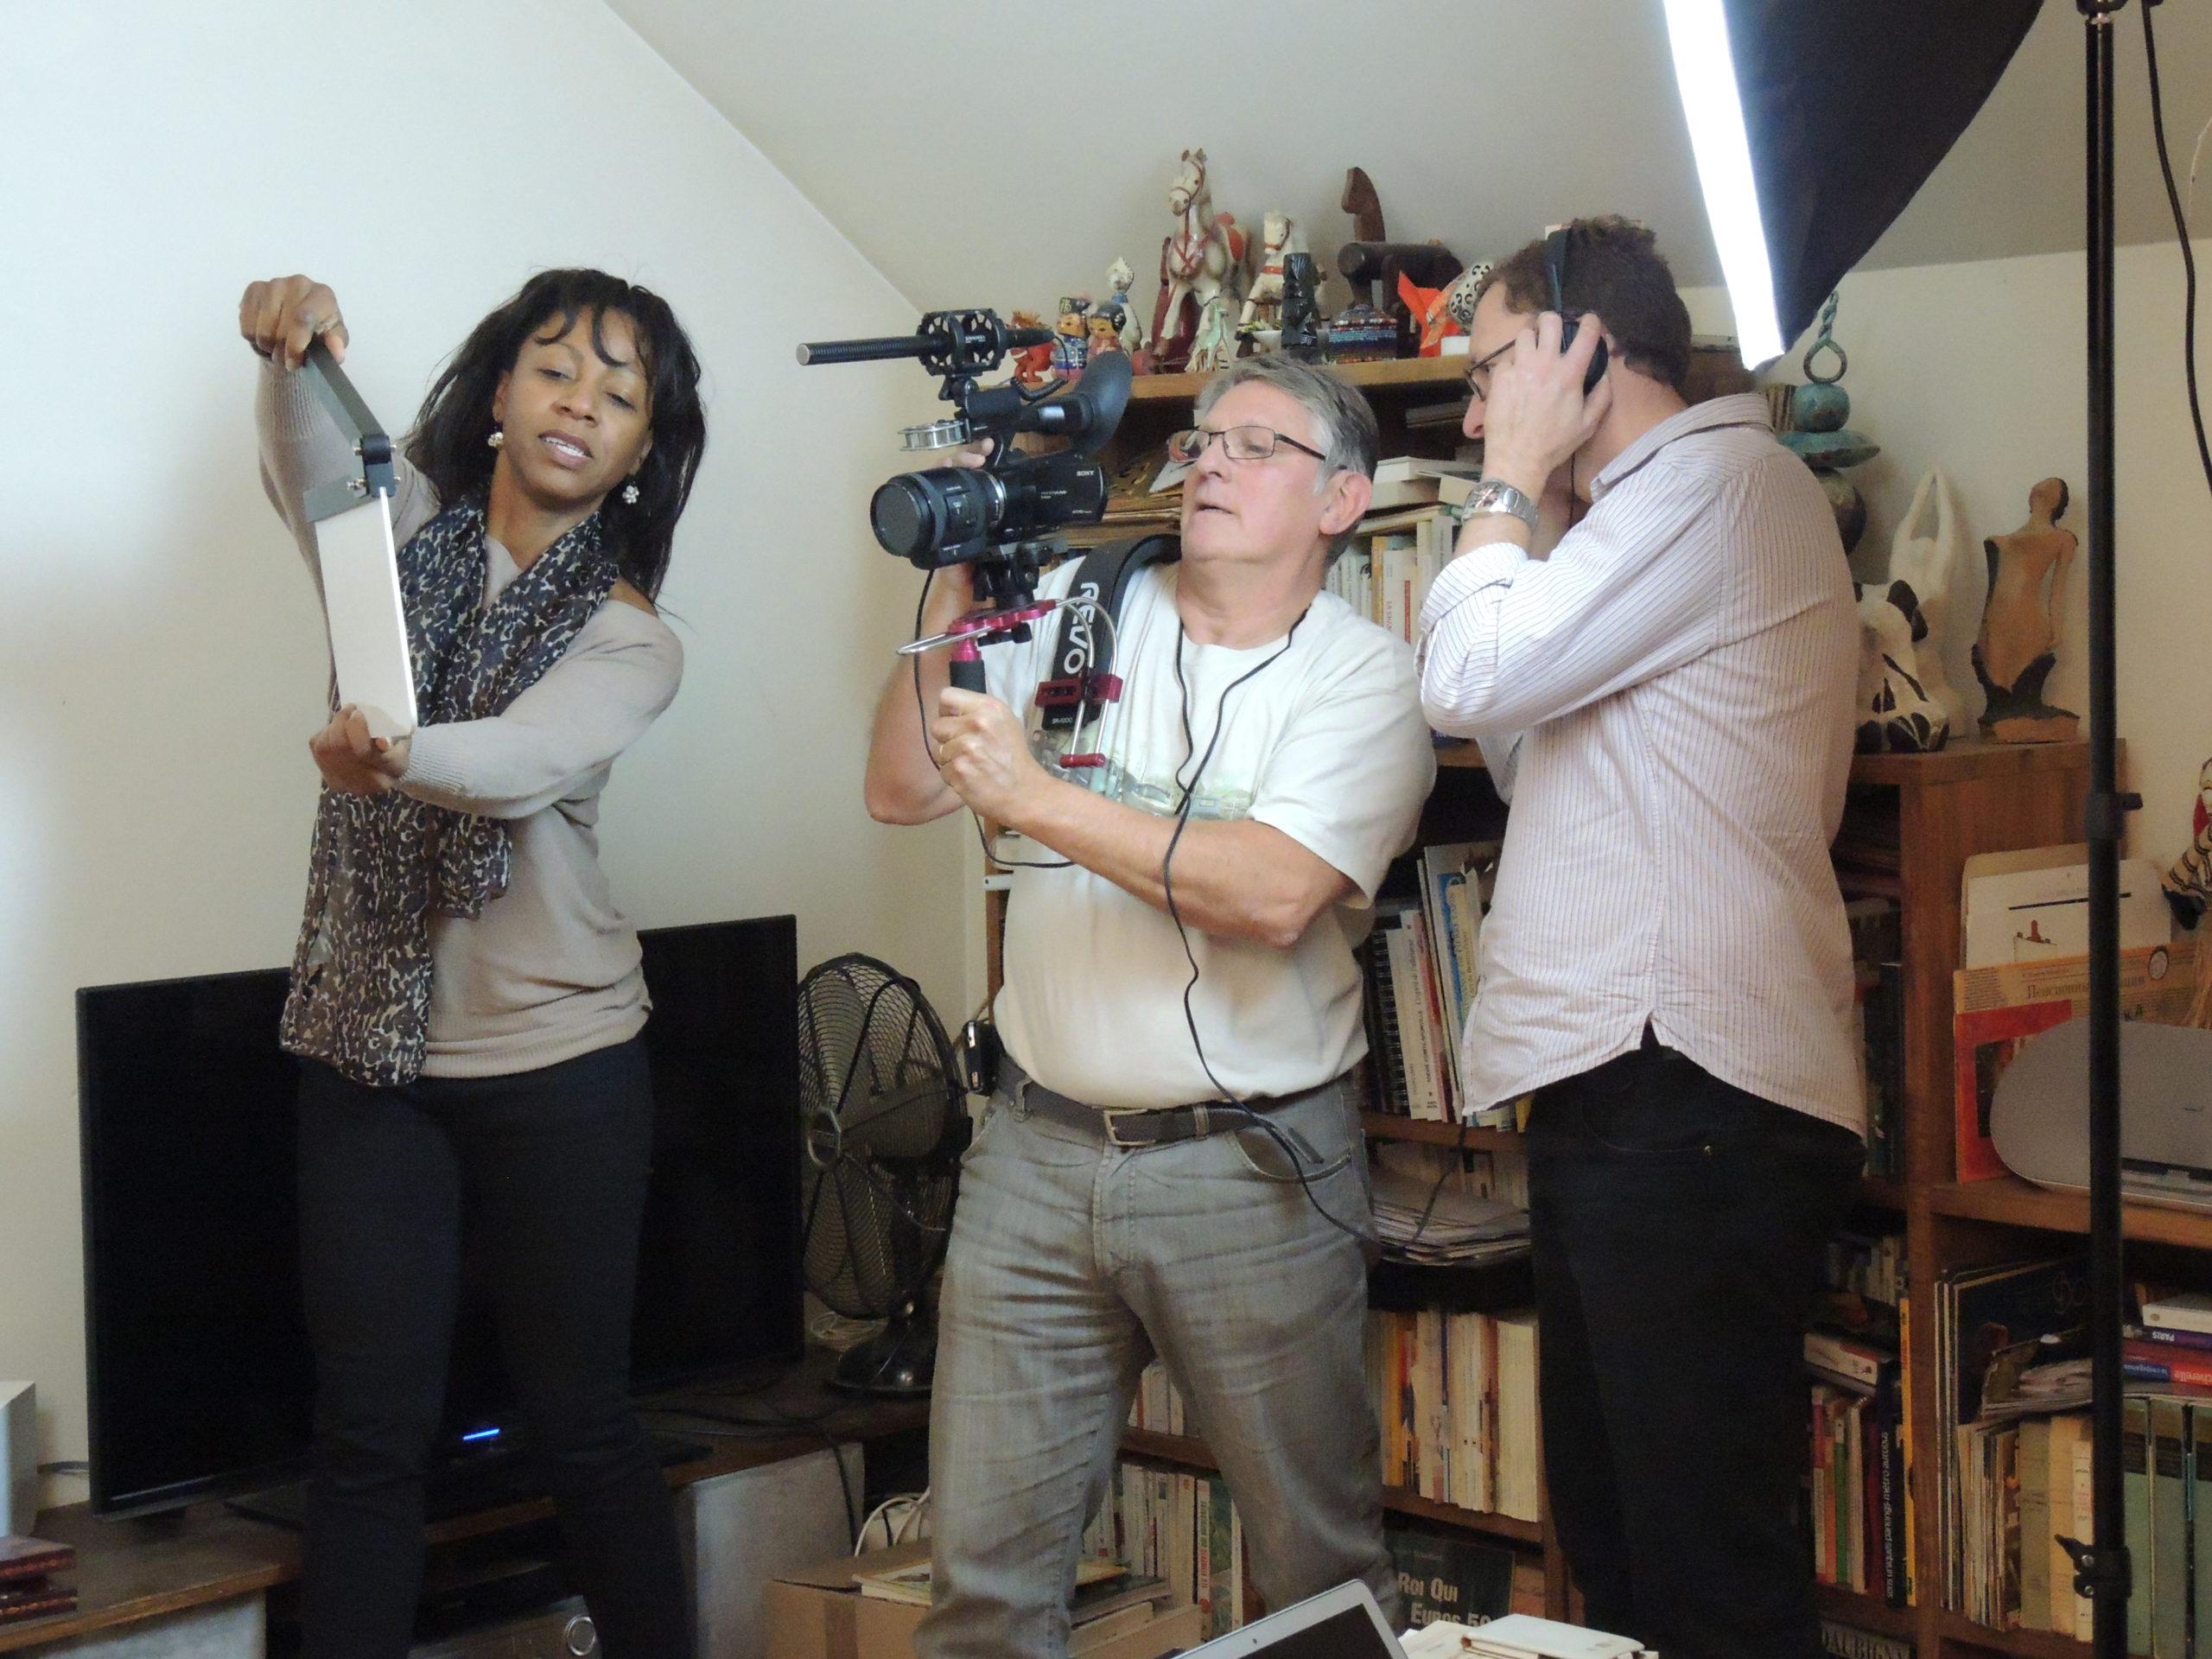 Game over photos tournage 54